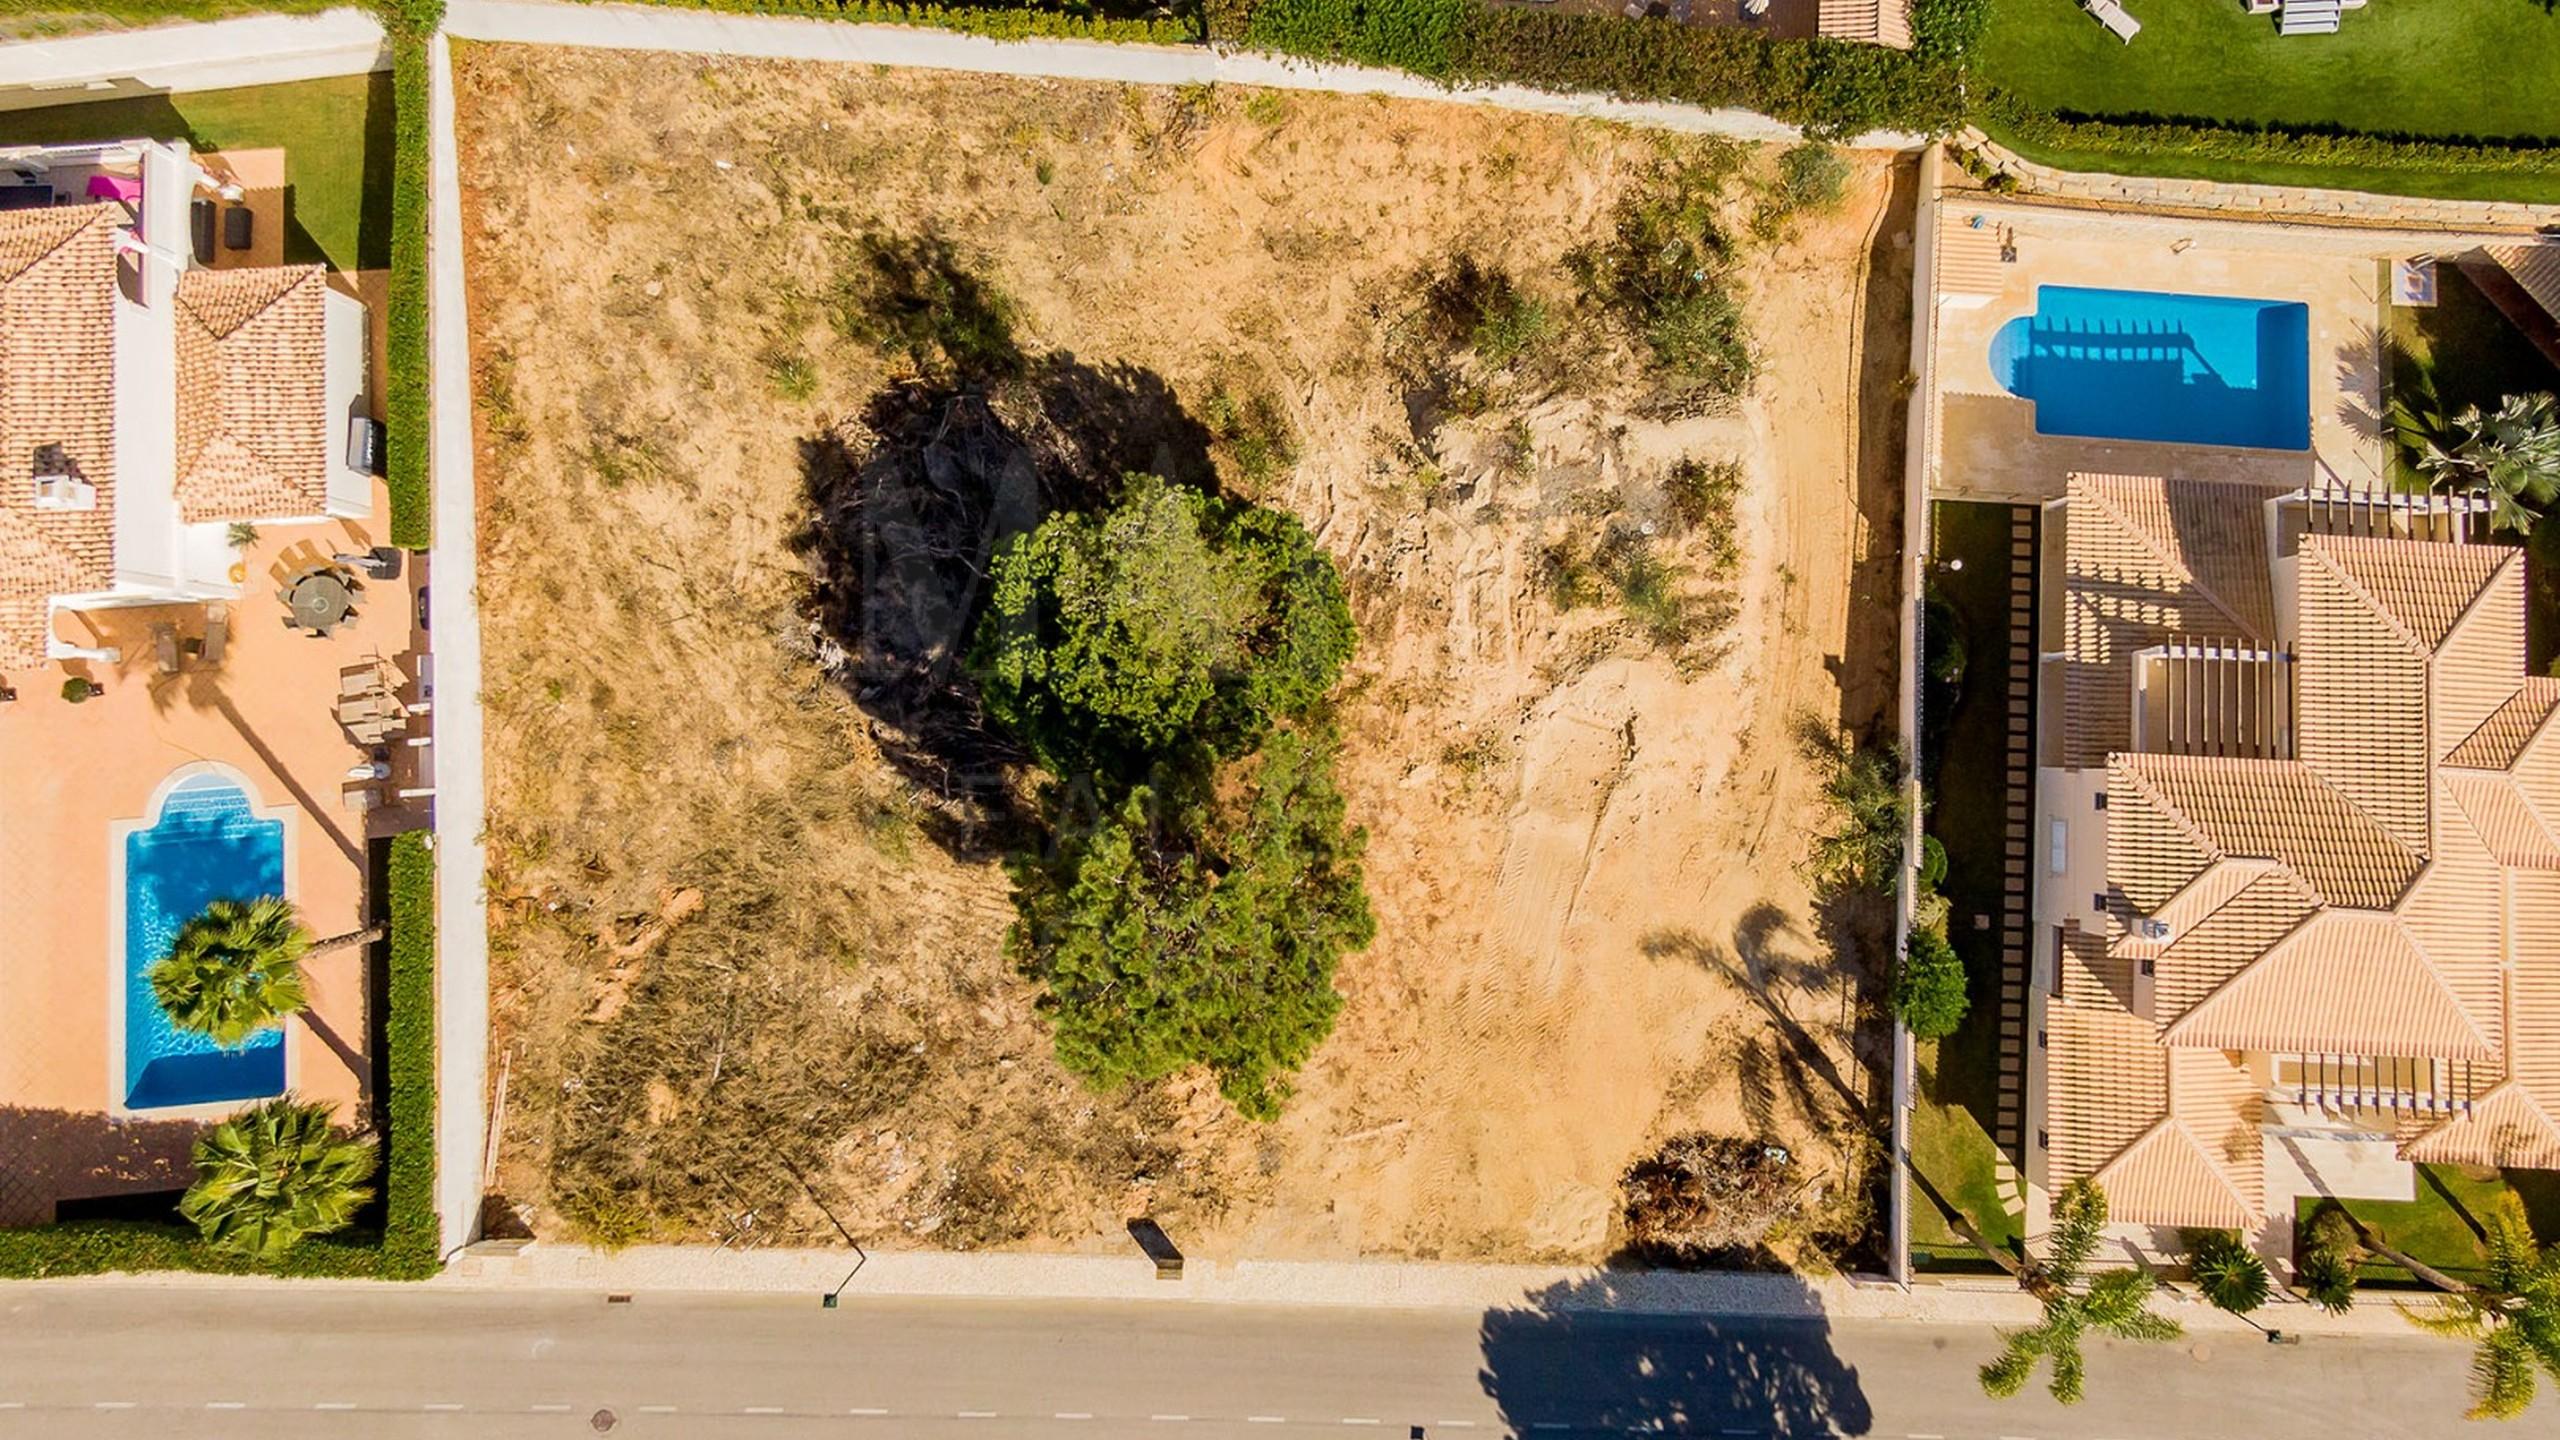 Terrain a vendre à Varandas do Lago, Algarve